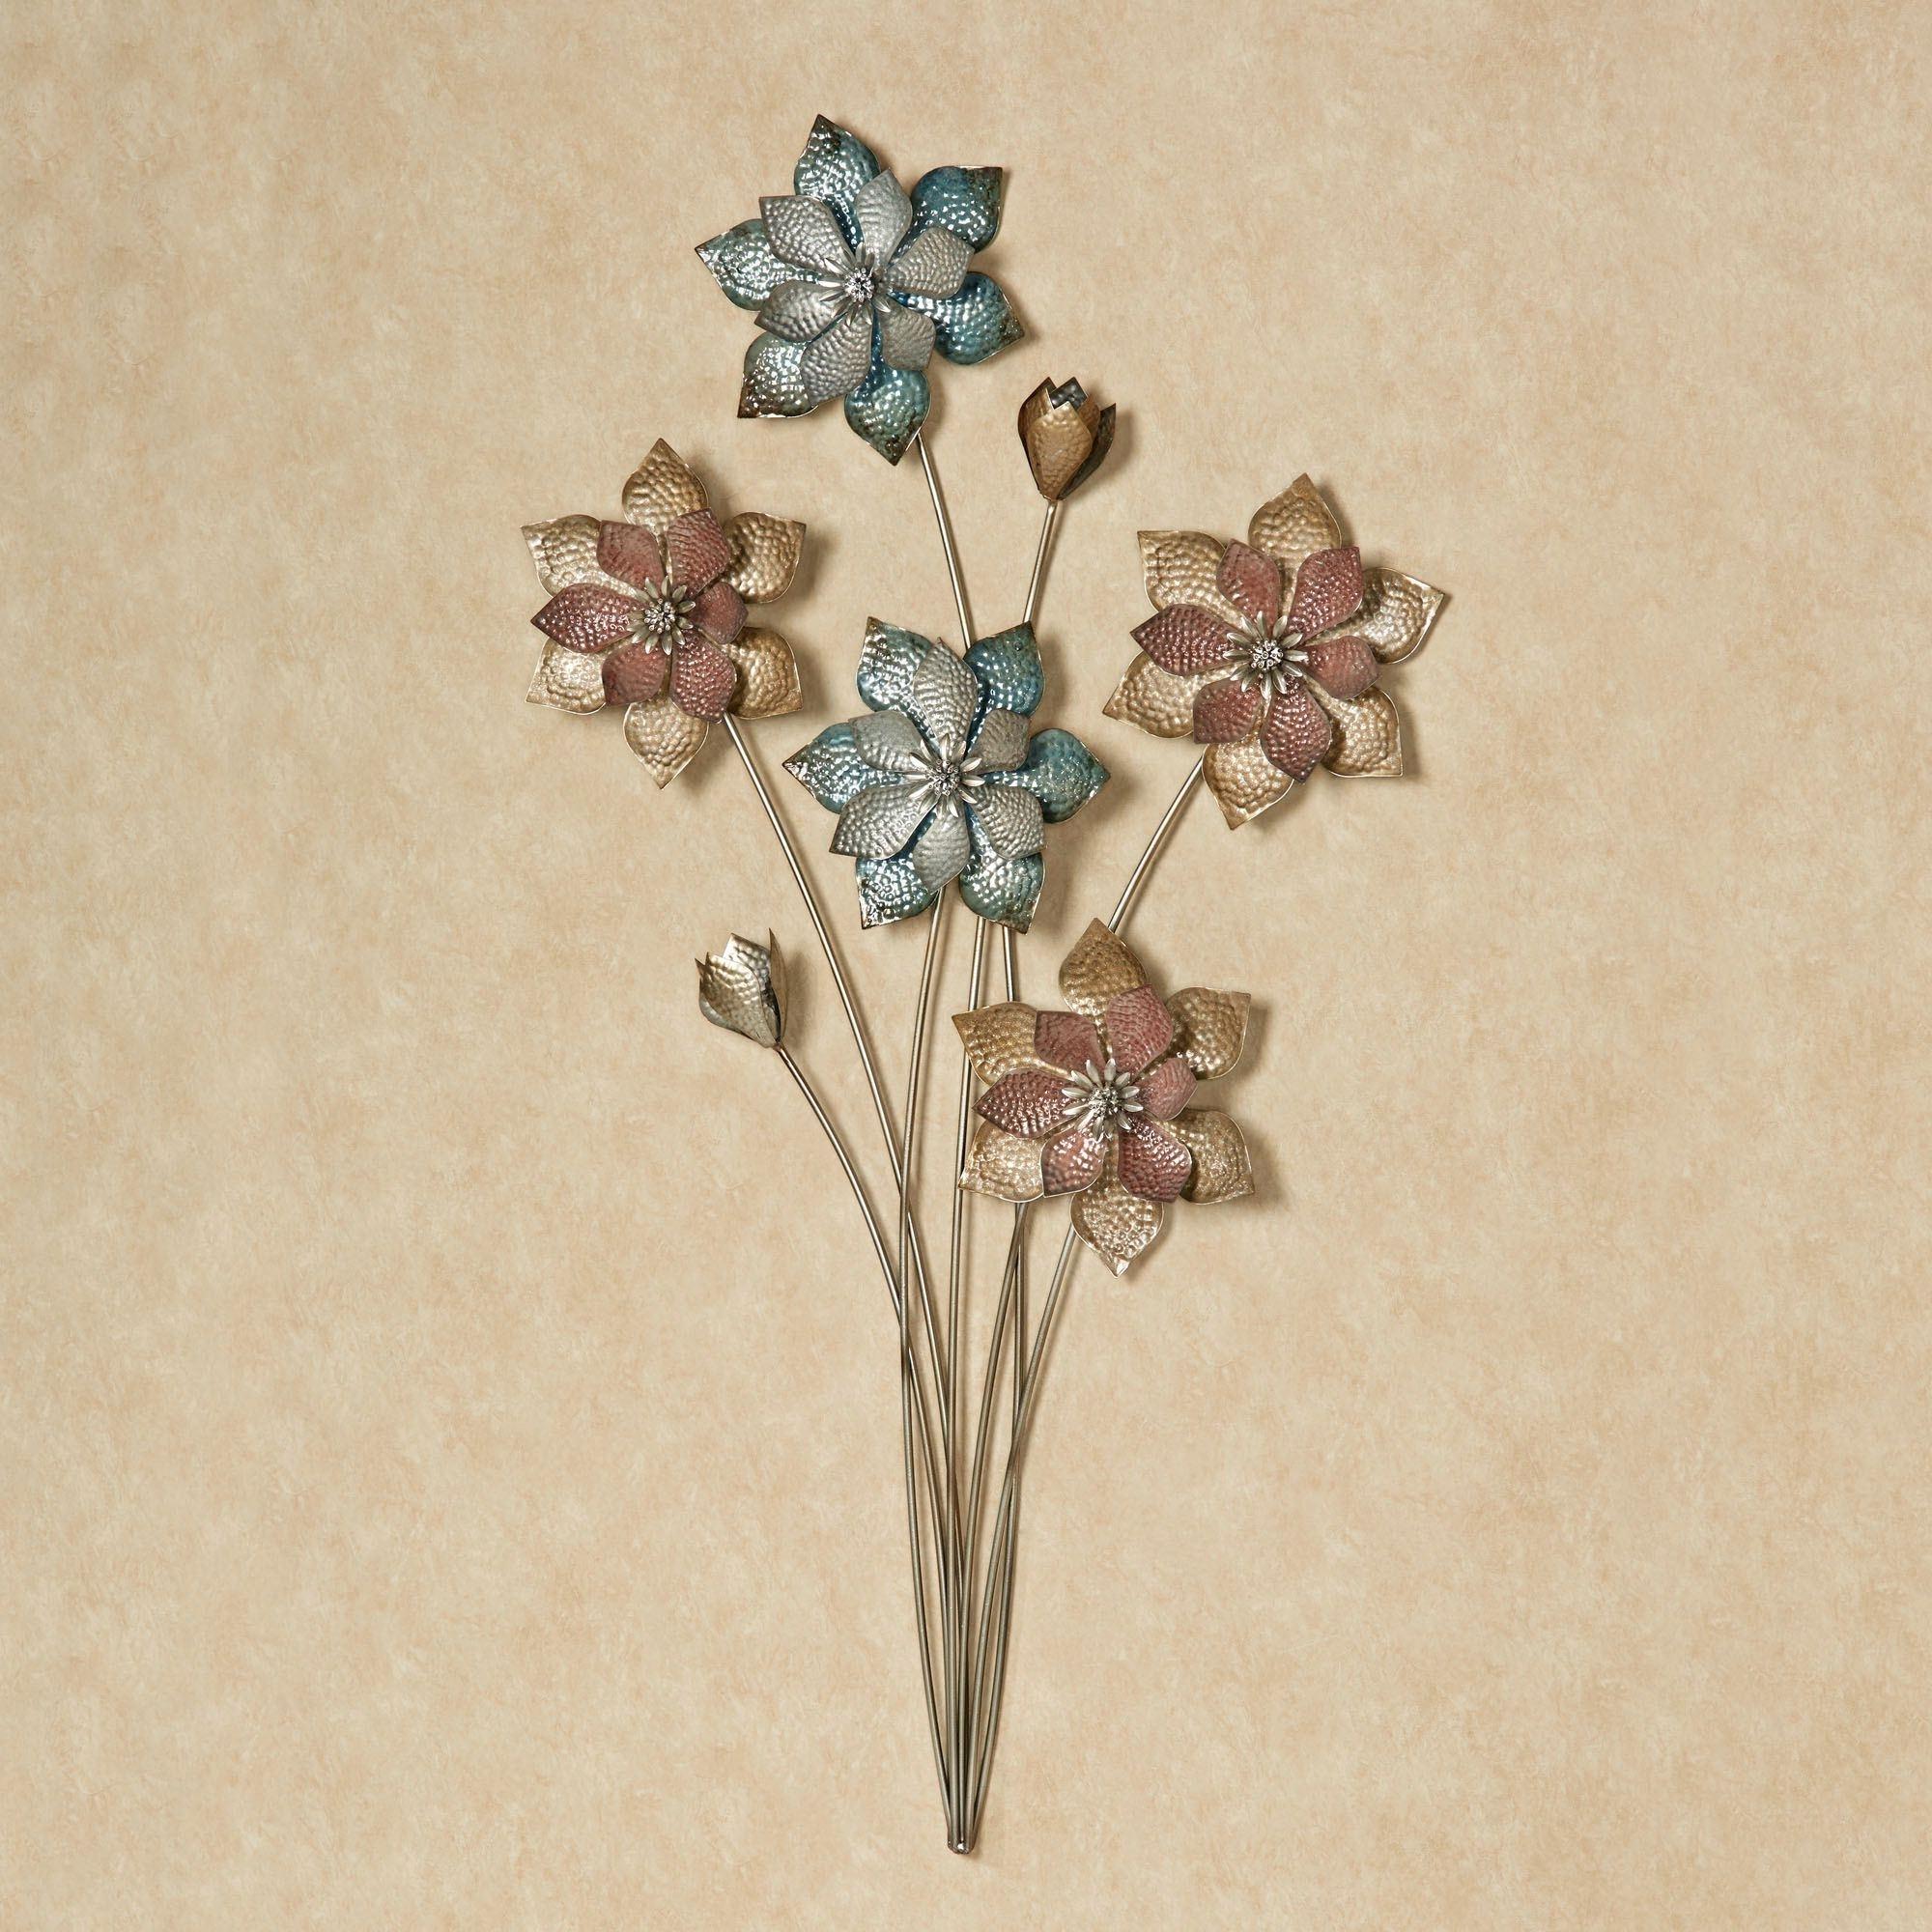 Metal Flower Wall Art Regarding Well Known Evening Flowers Metal Wall Art (View 9 of 15)